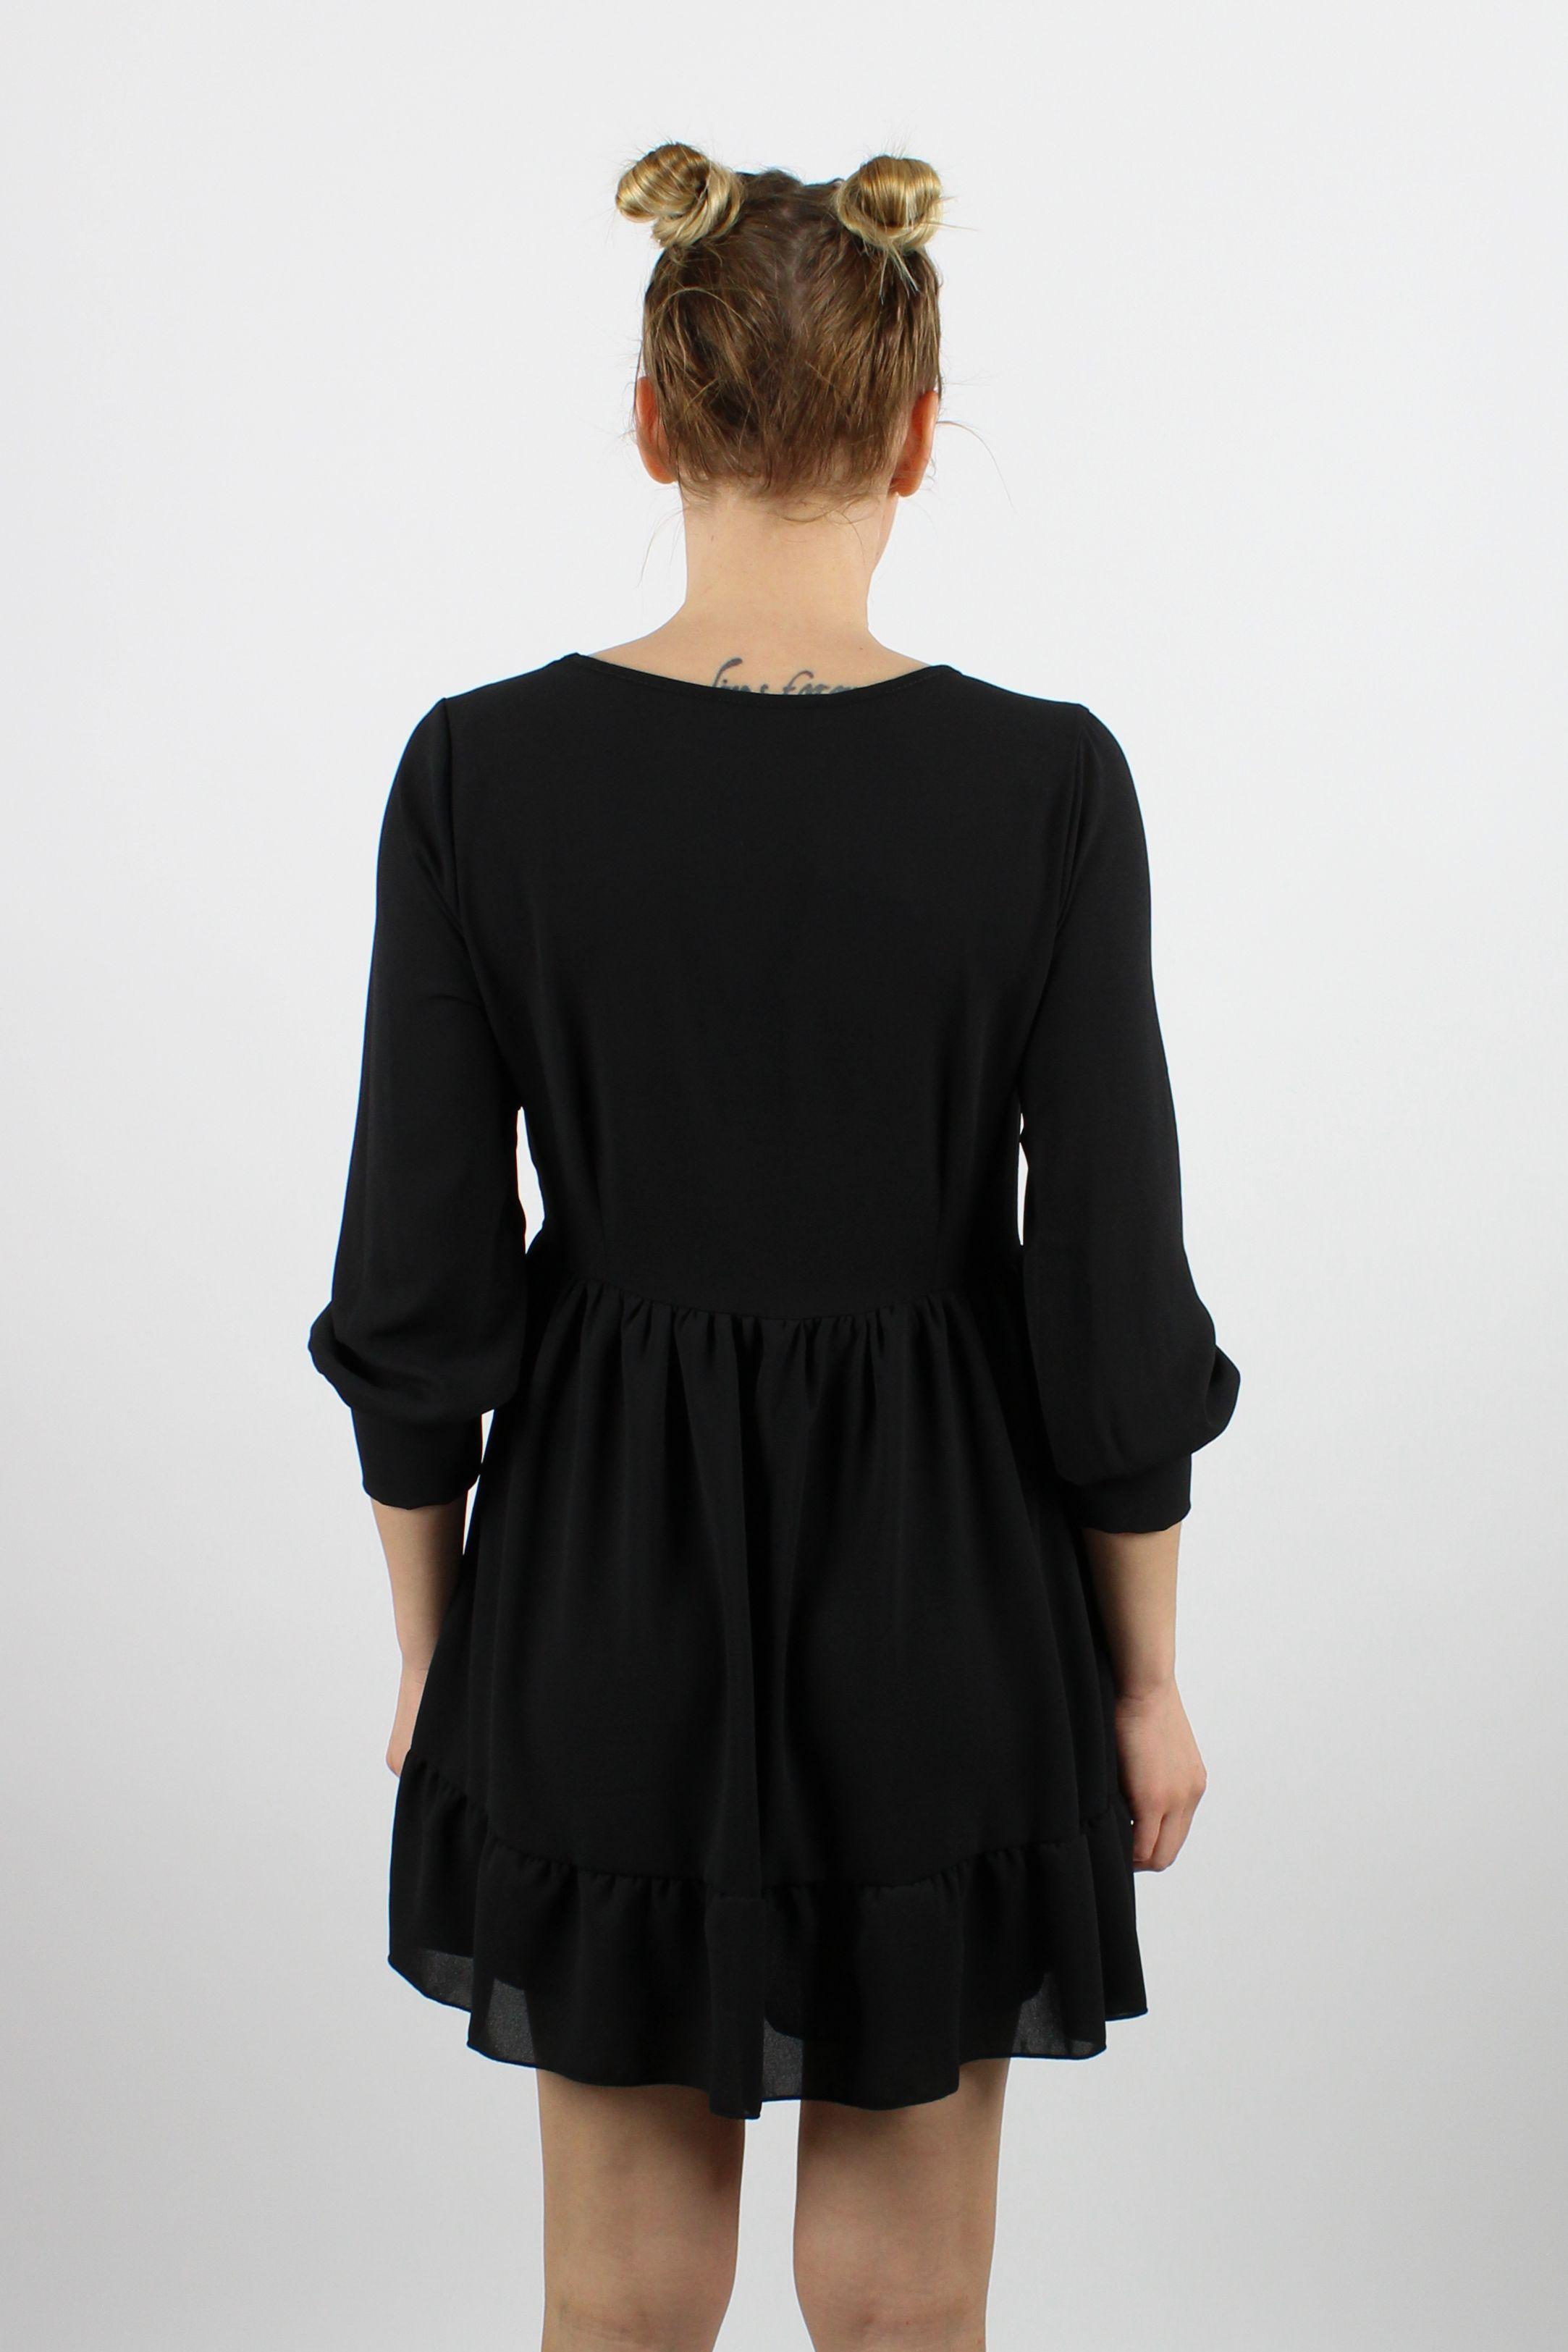 642012d0163 Volánové šaty - Brands Made in Italy